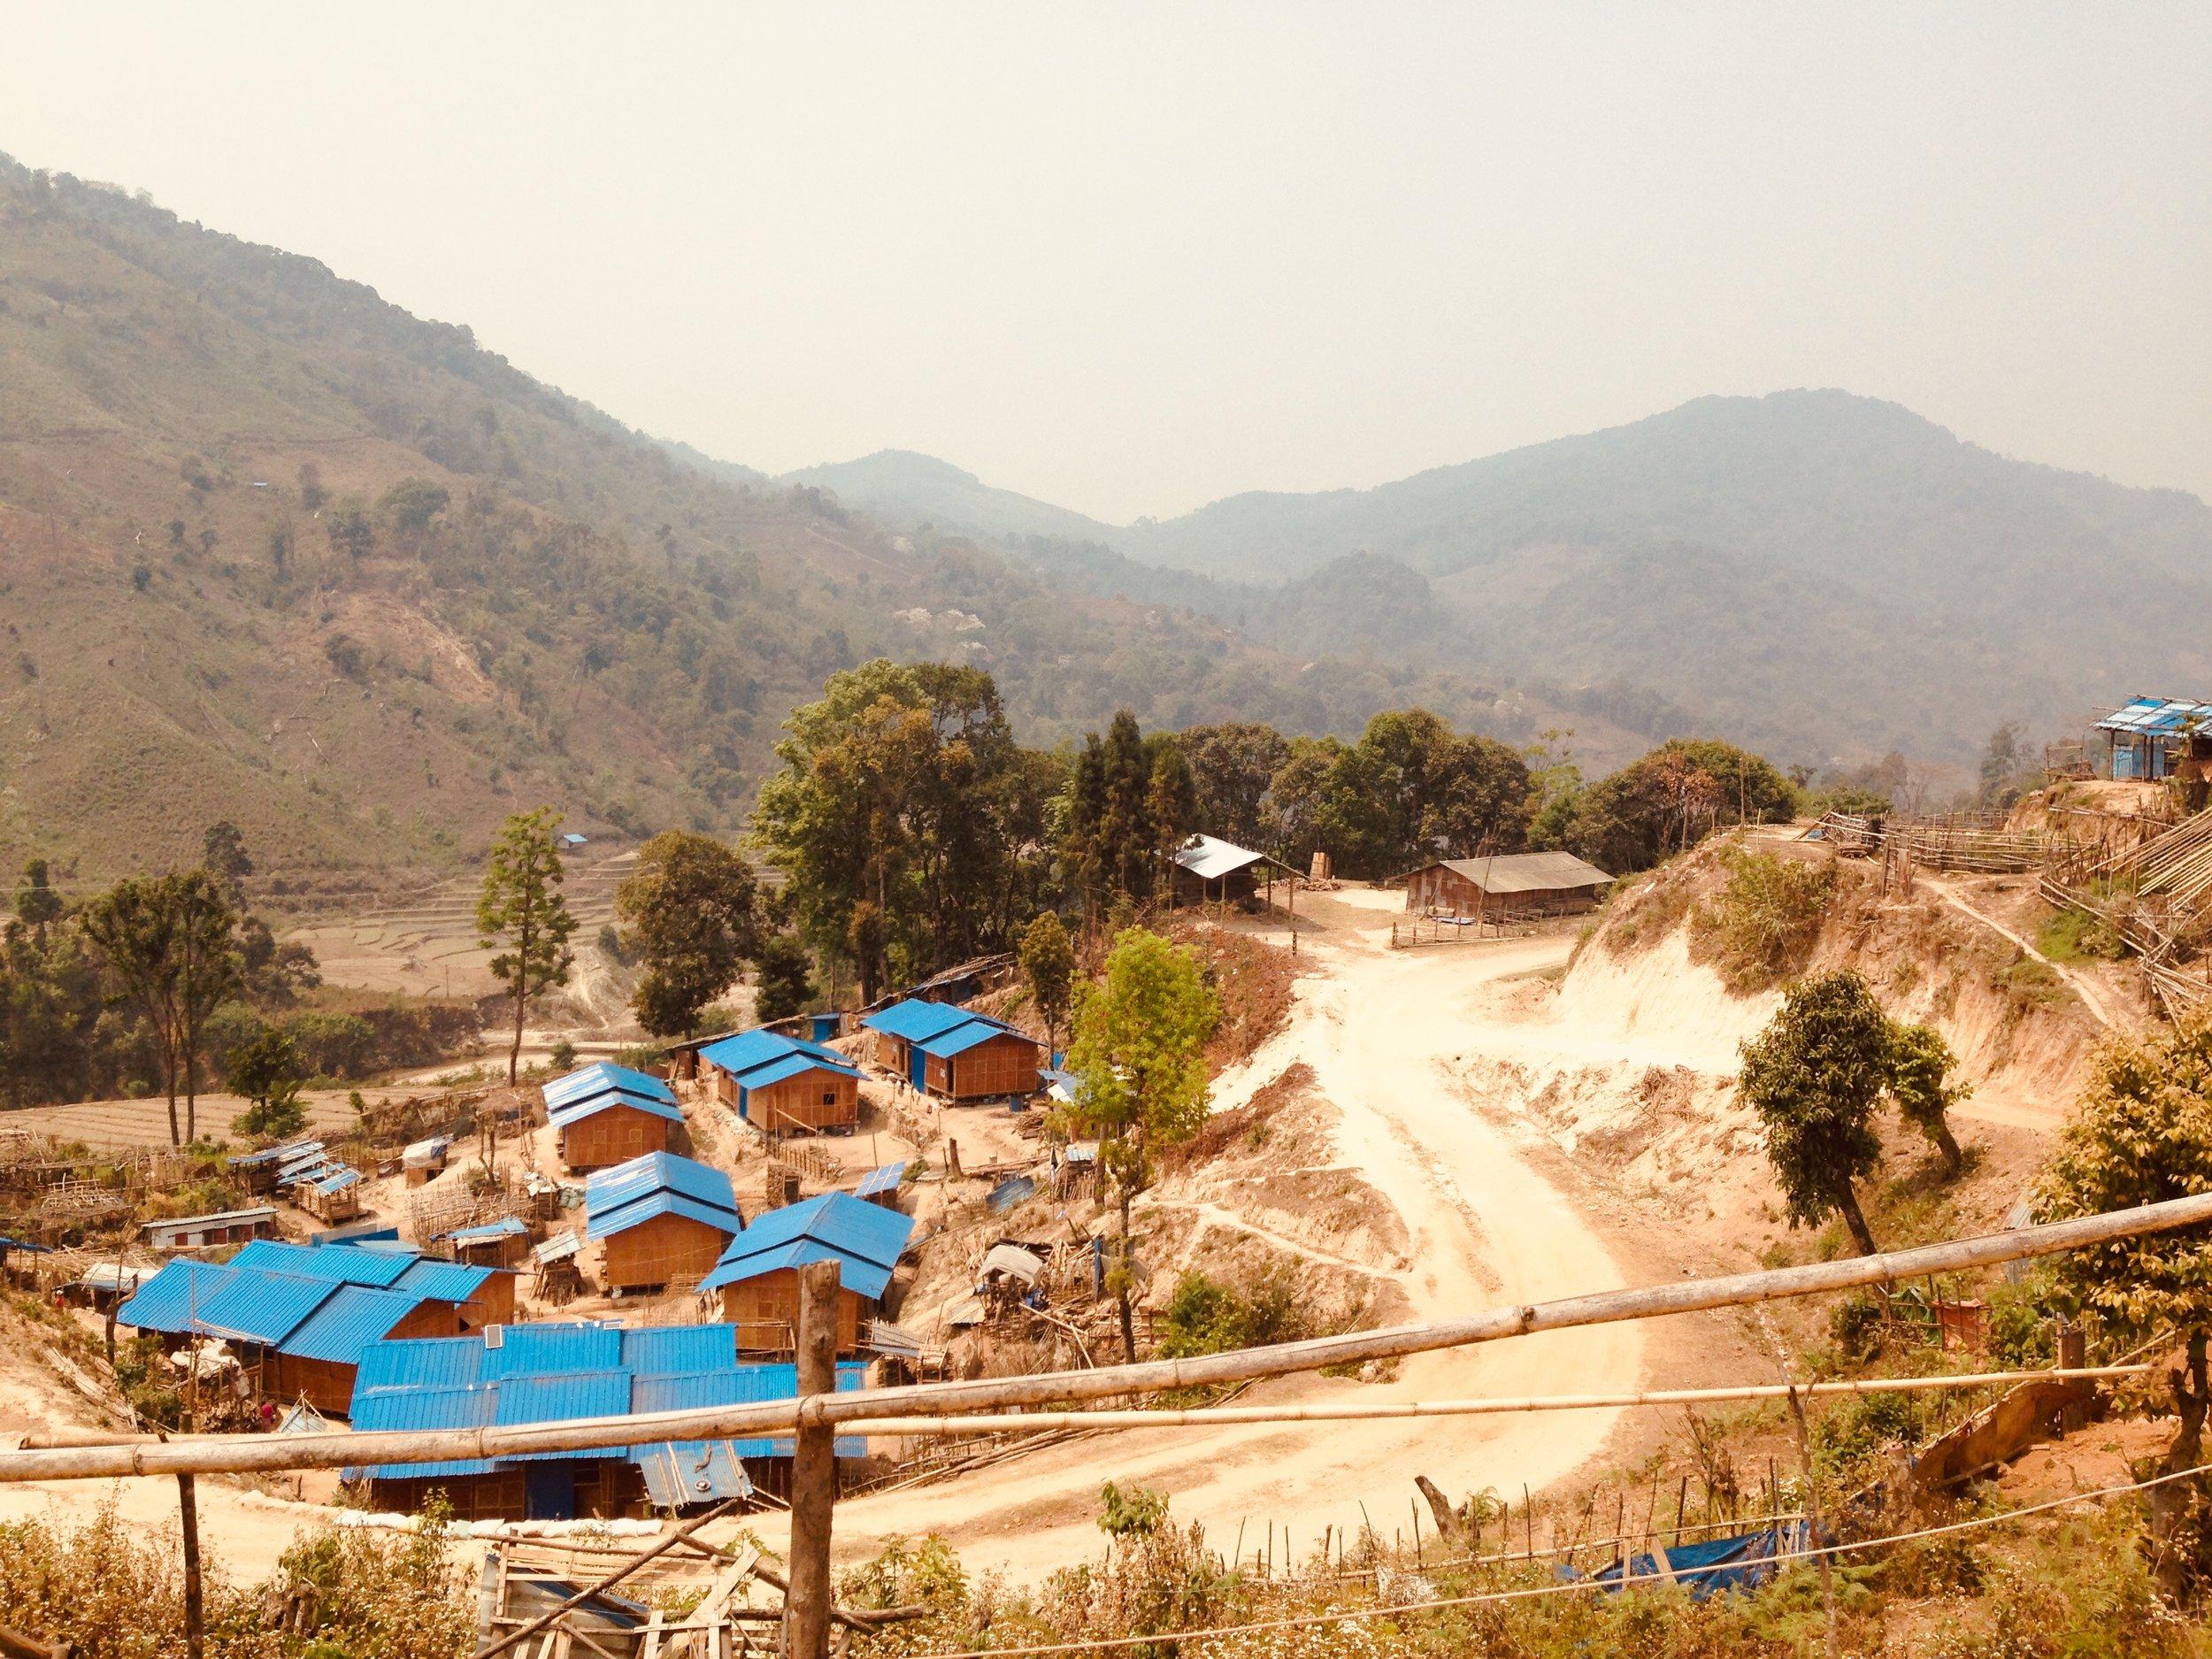 Nhkwang pa Dabang IDP, Myanmar